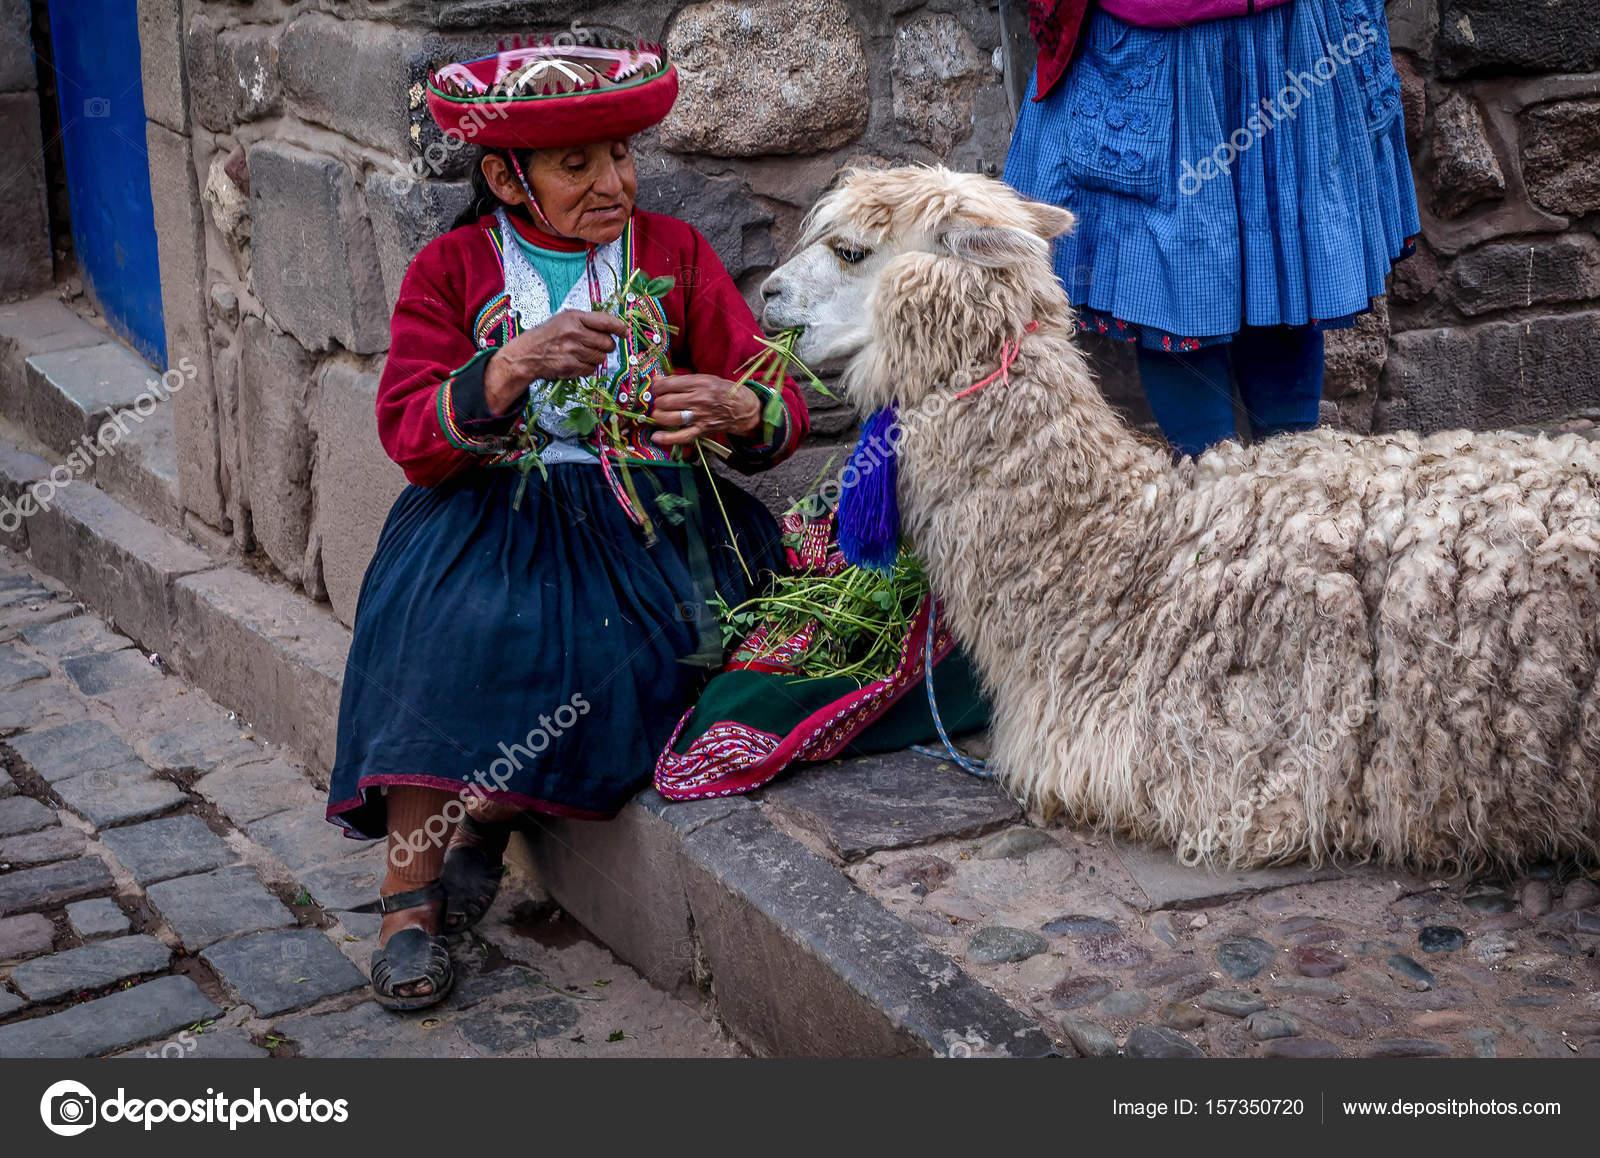 68dbf7de5349 Παλιά οι γυναίκες με παραδοσιακή ενδυμασία σίτιση αλπακά σε Pisac ...